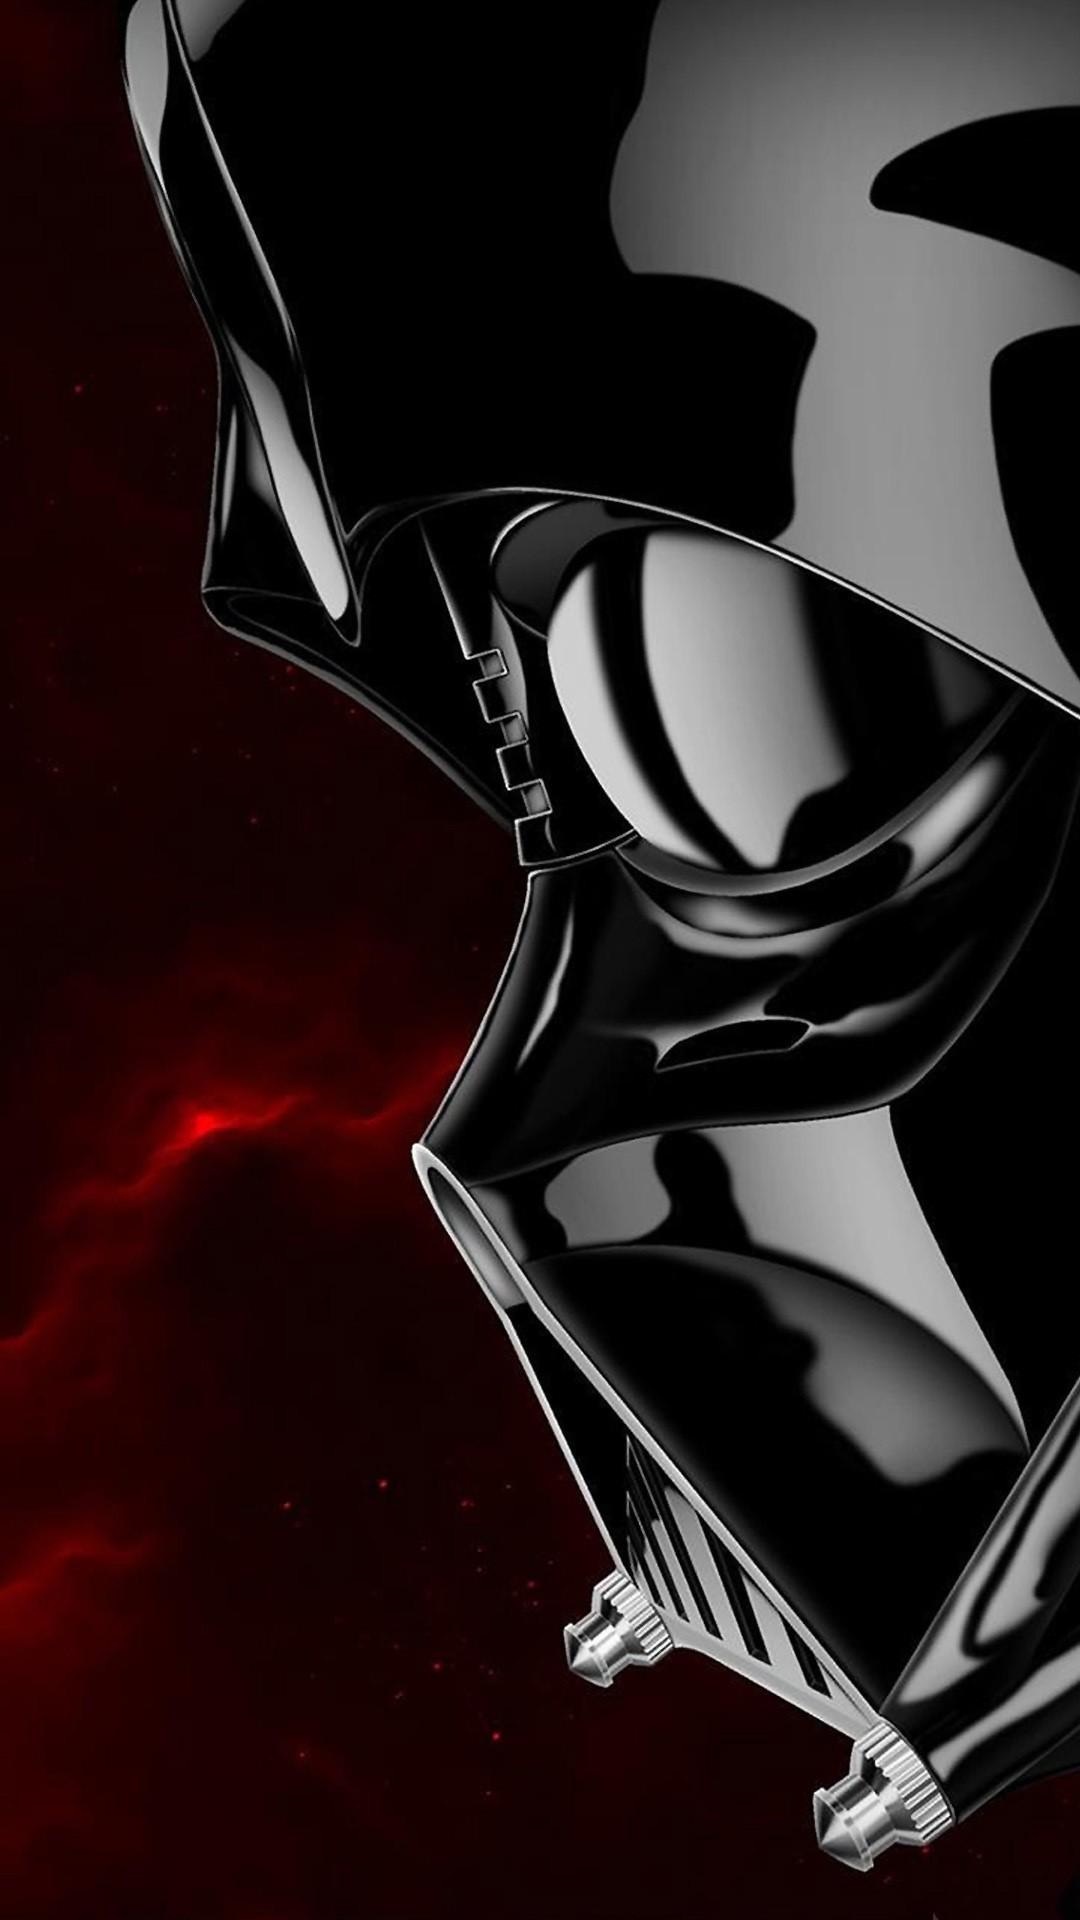 Star Wars – Mobile Wallpapers – Imgur